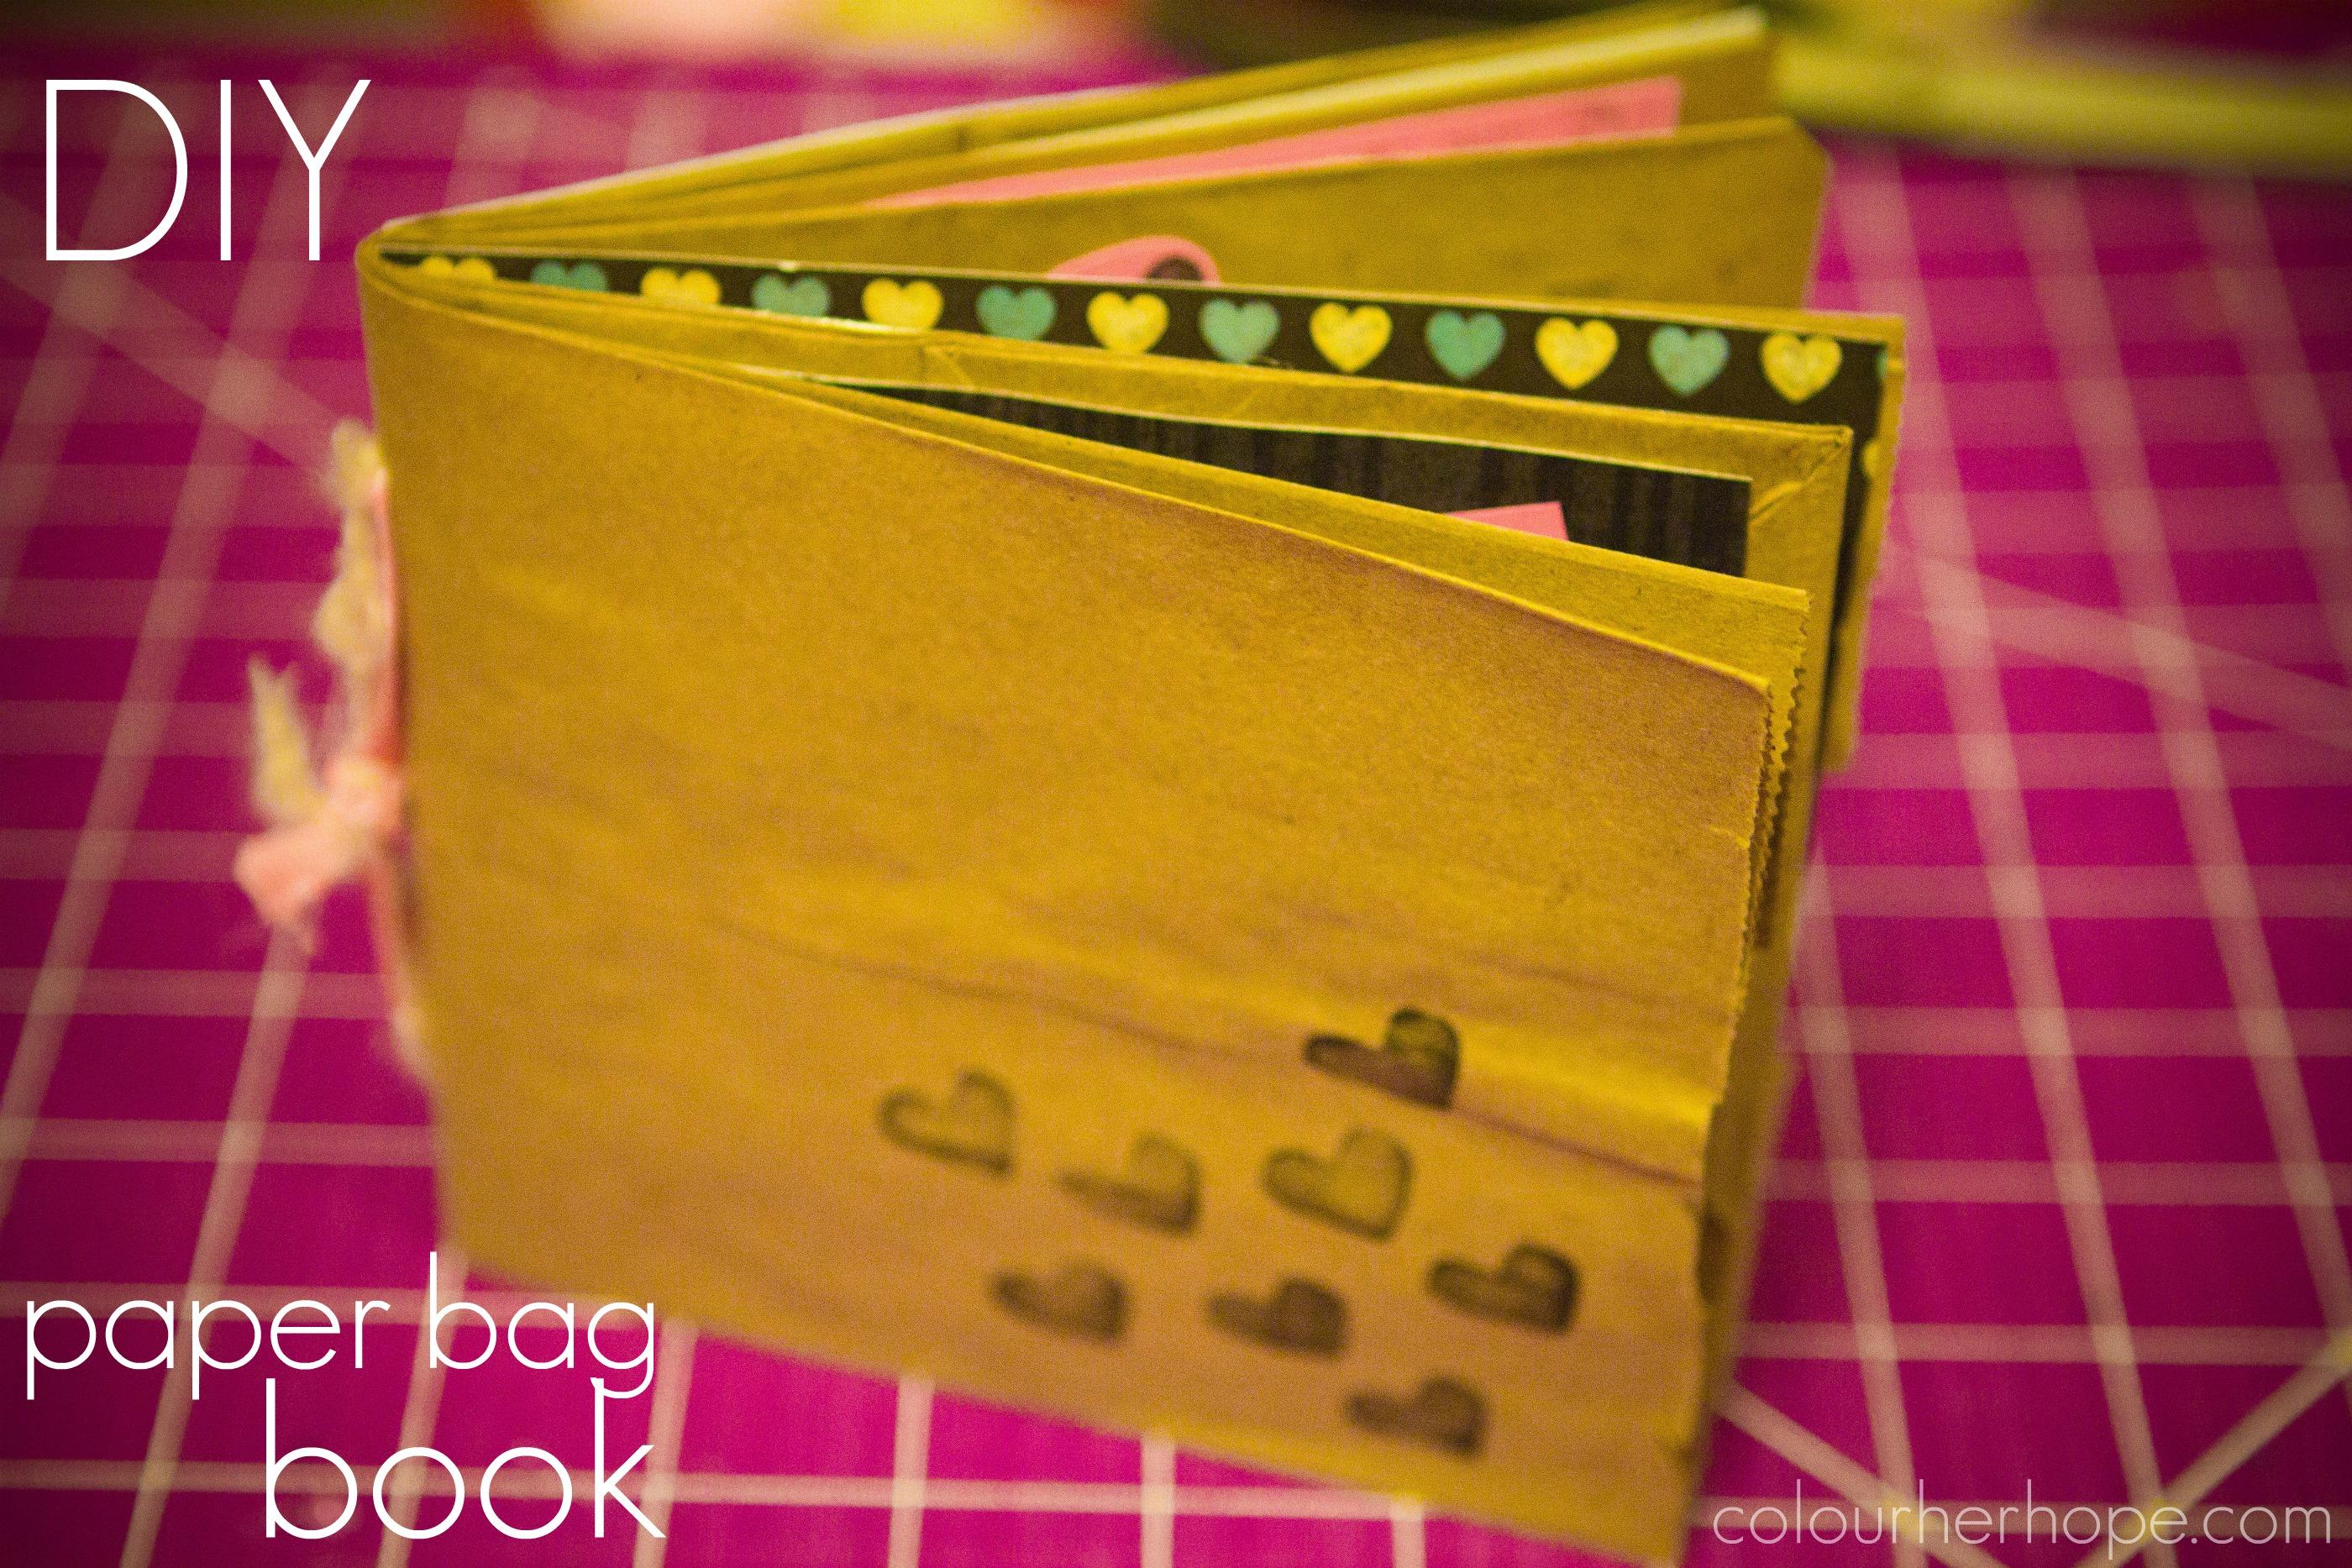 Paper Bag Book Cover Decoration ~ Diy paper bag book colour her hope